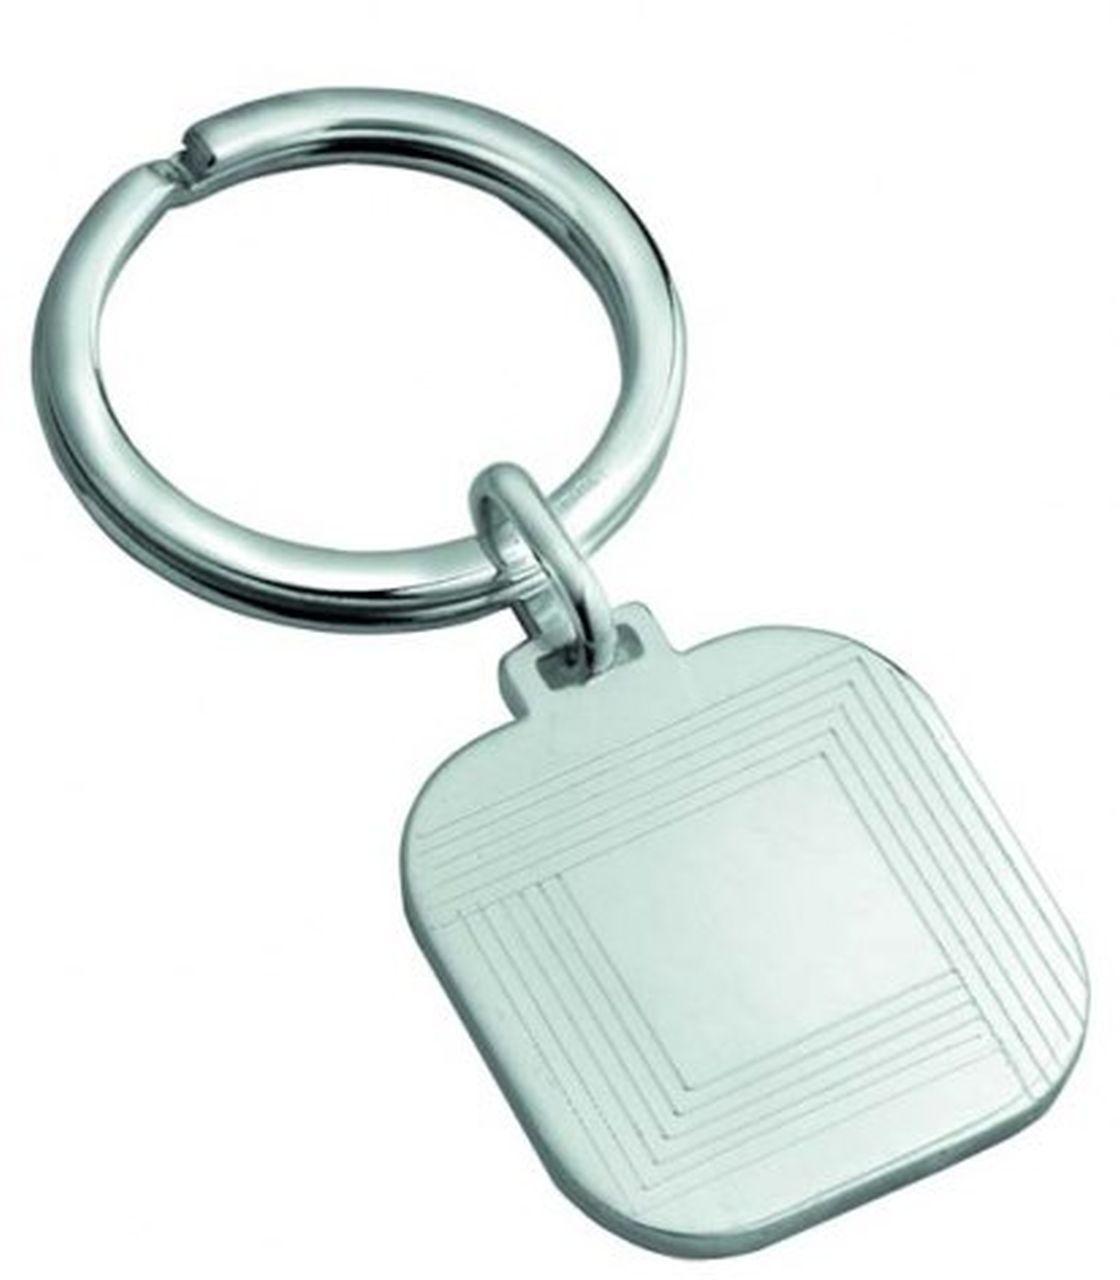 Portachiavi in ARGENTO 925 cm.6,5x3,1x0,5h